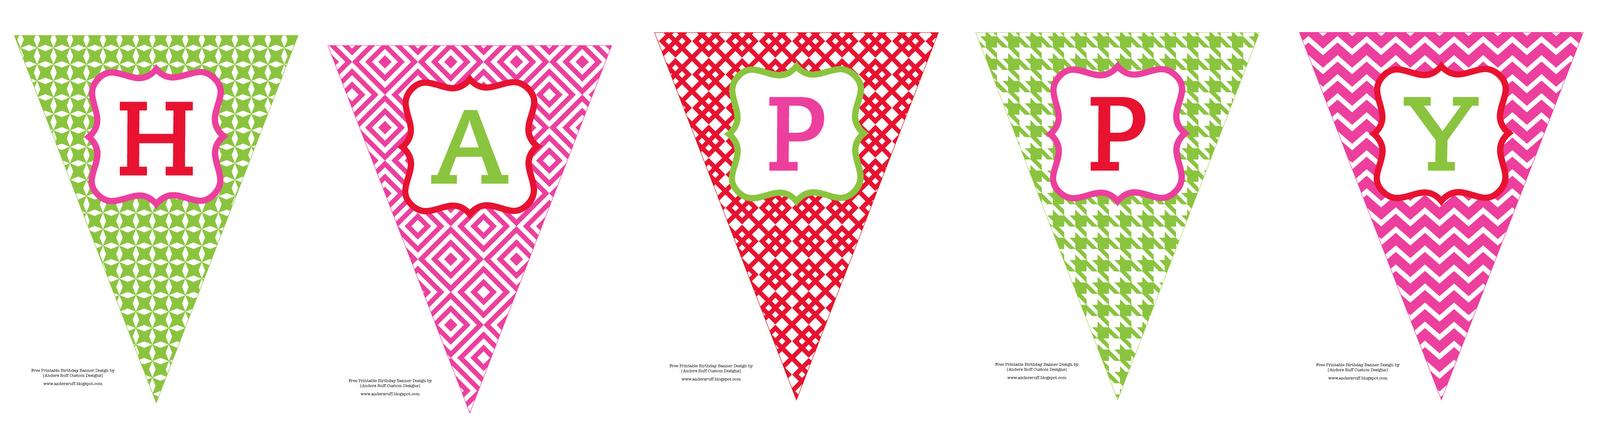 Free Printable: Happy Birthday Banner - Anders Ruff Custom Designs  Inside Free Printable Happy Birthday Banner Templates In Free Printable Happy Birthday Banner Templates